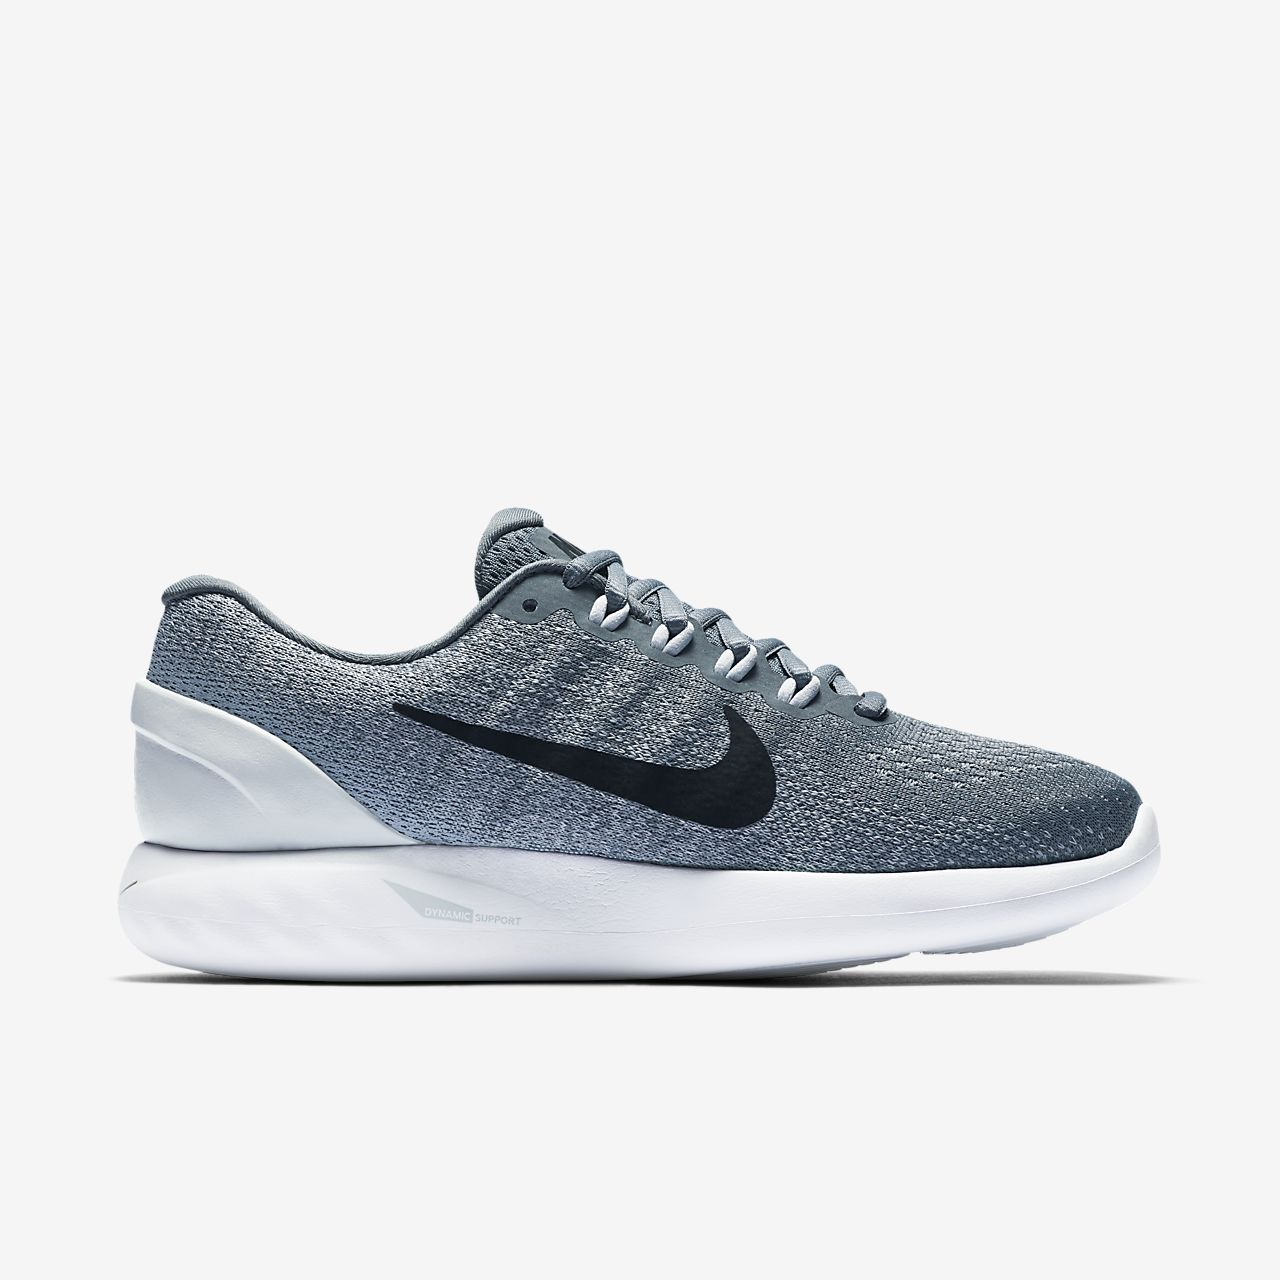 reputable site 5a9aa 52a9a Nike LunarGlide 9